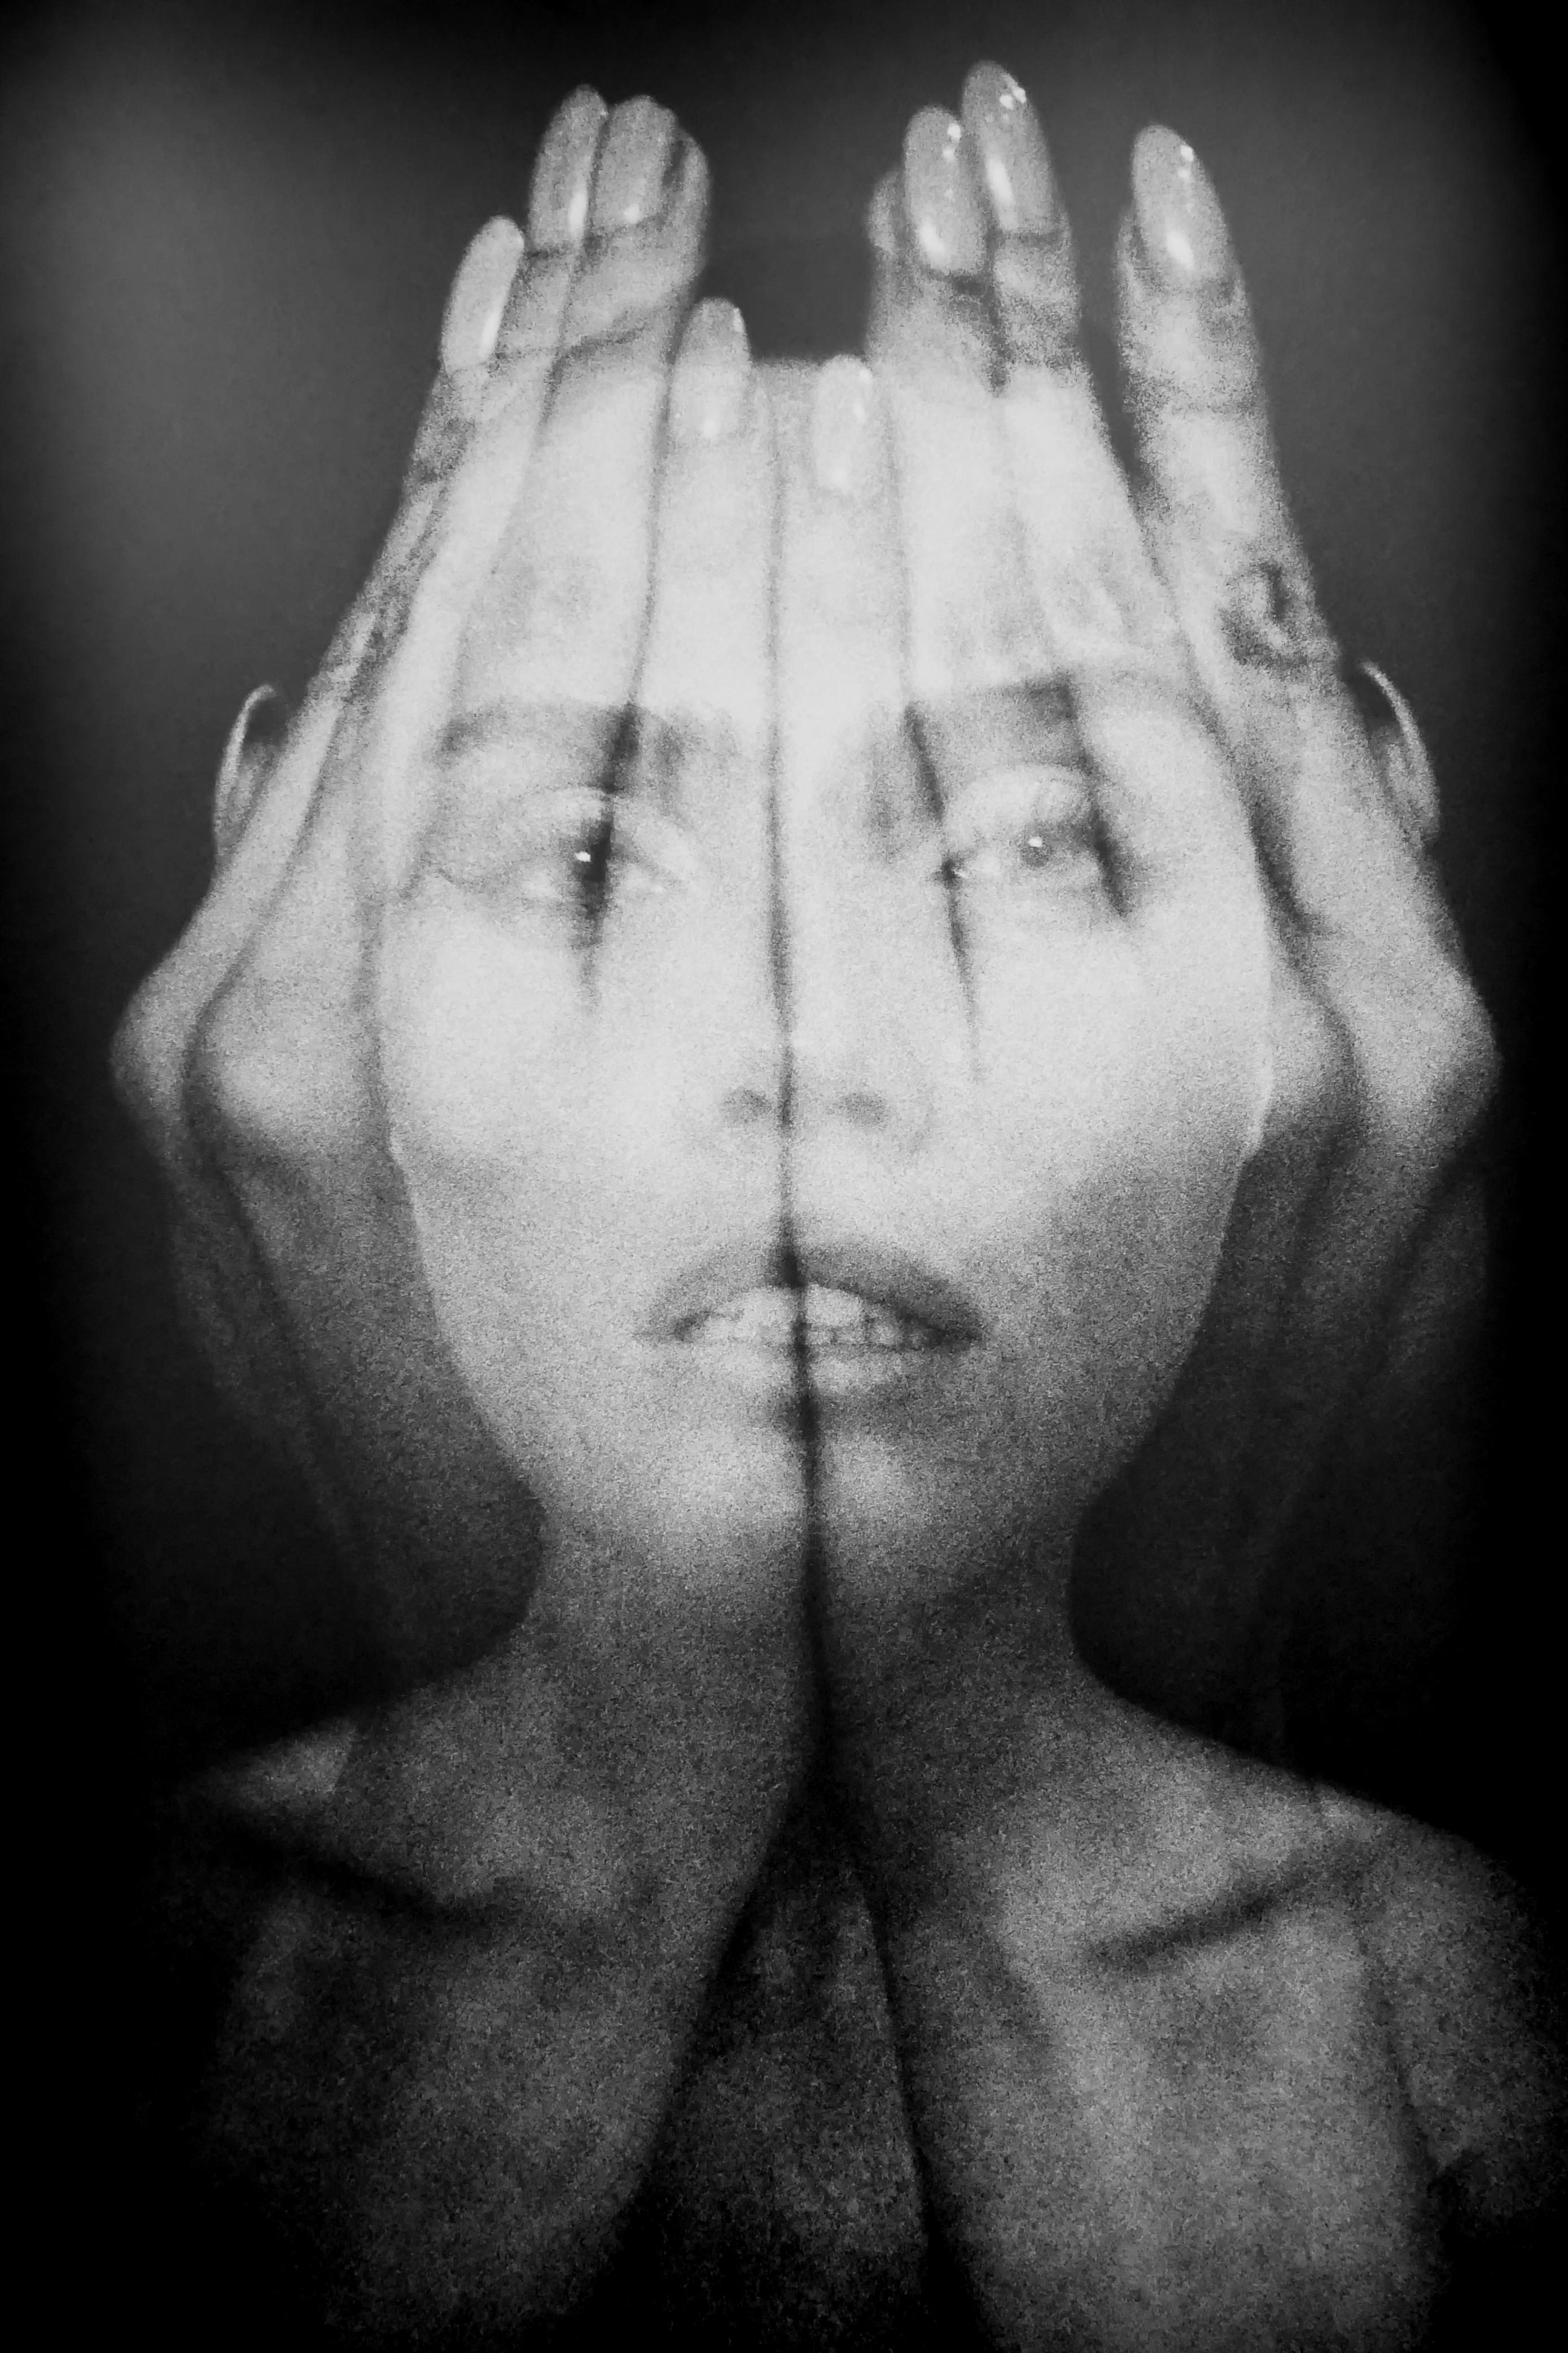 Selfie Kim Feenstra nude photos 2019